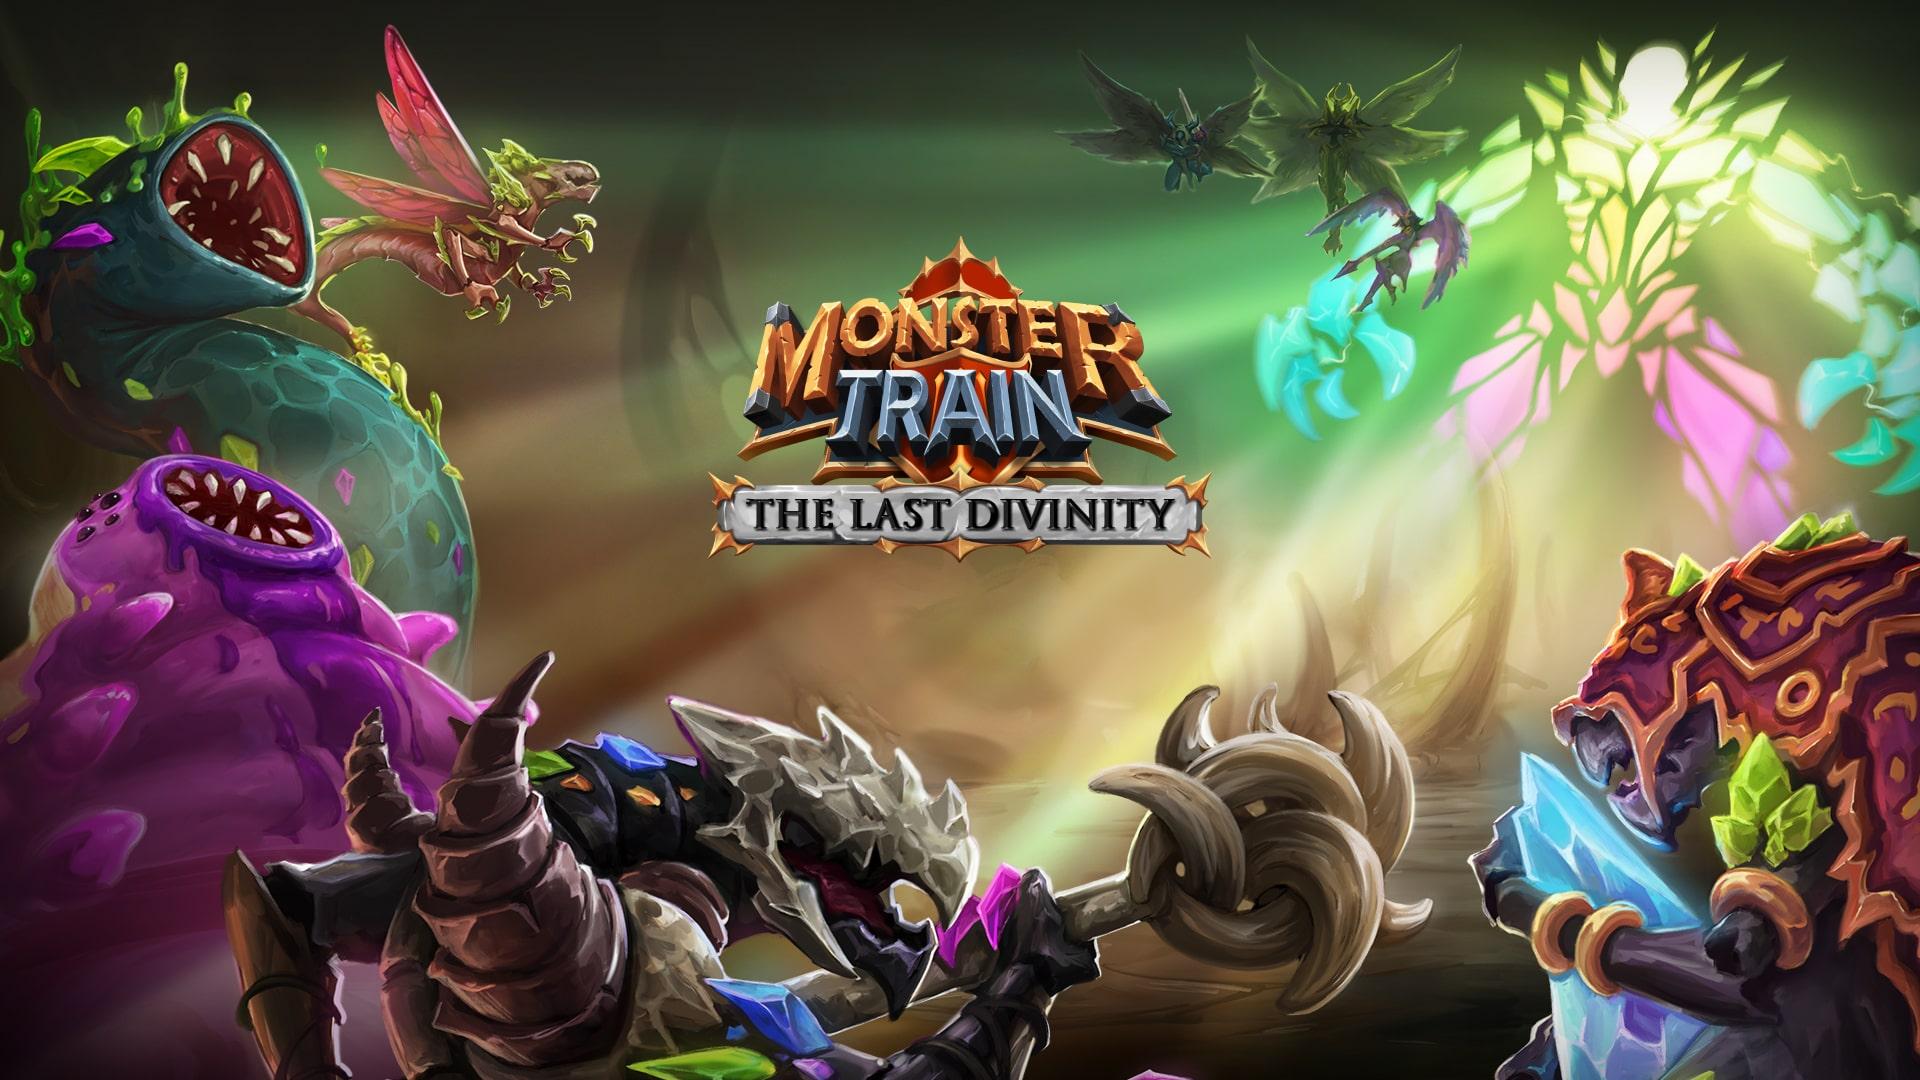 The last divinity hero thumbnail